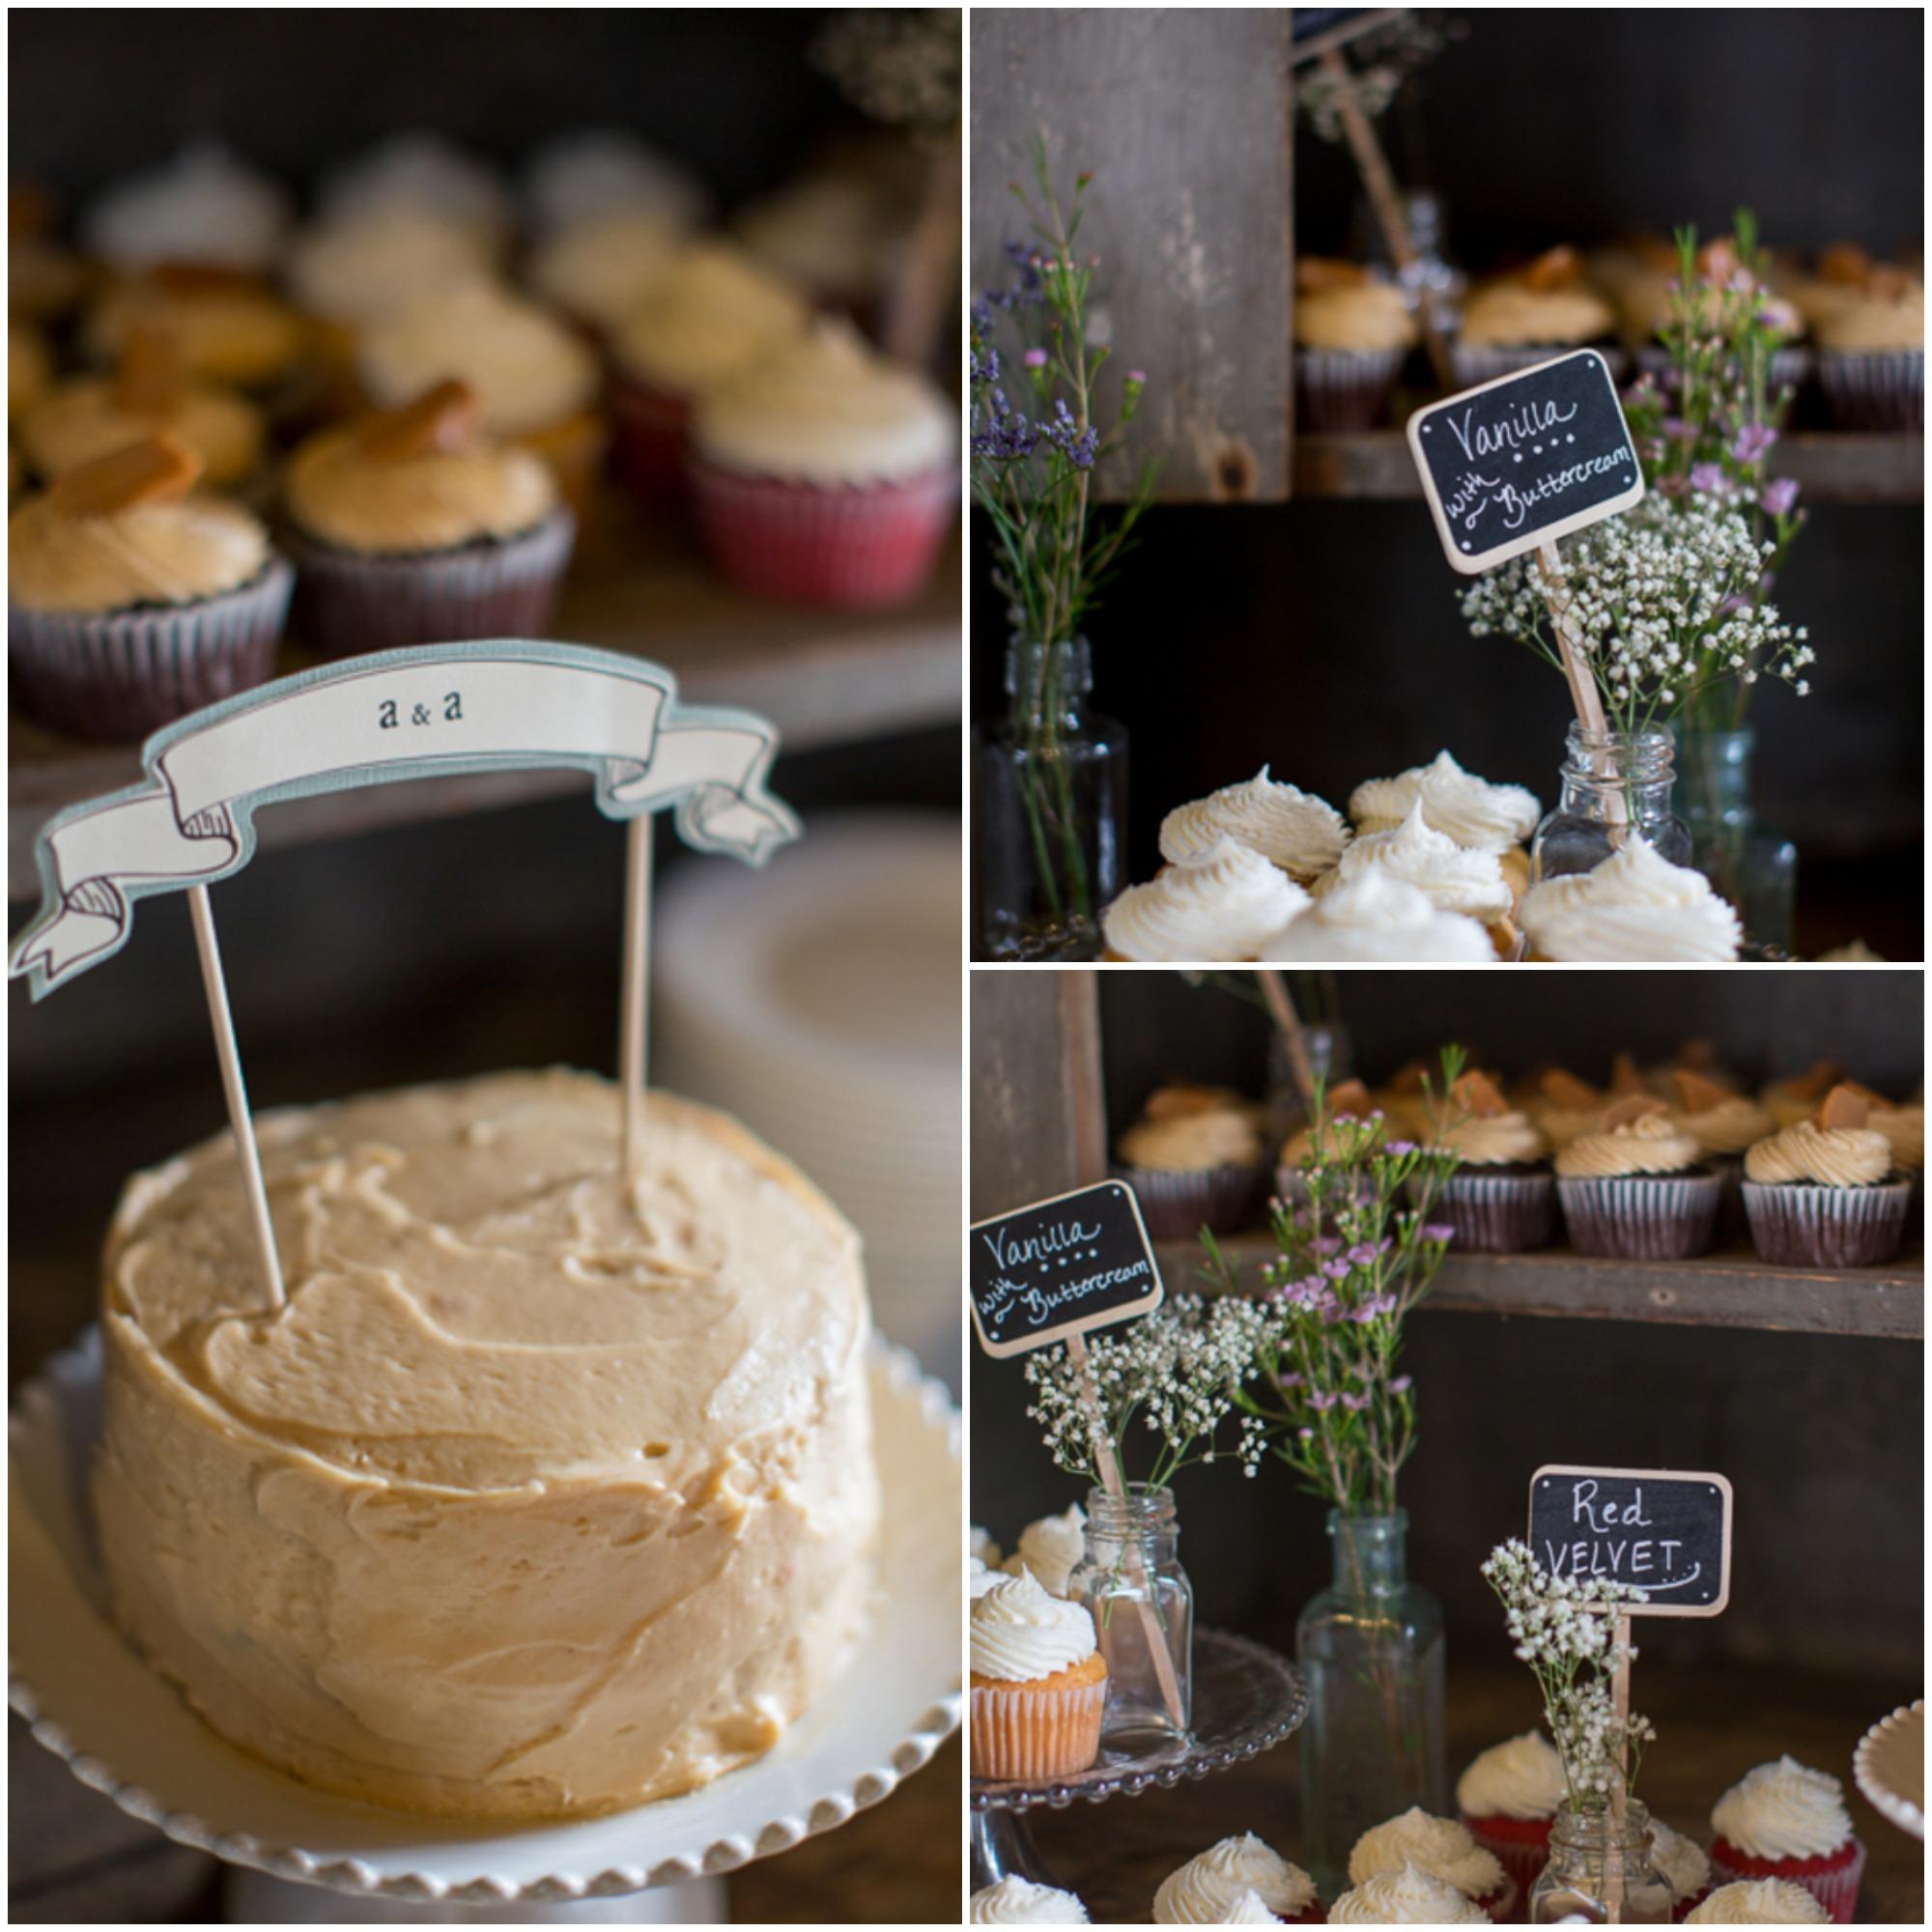 Rustic Wedding Country Barn Farmhouse Wedding Cake Cupcake: Farm Wedding With Vintage Details